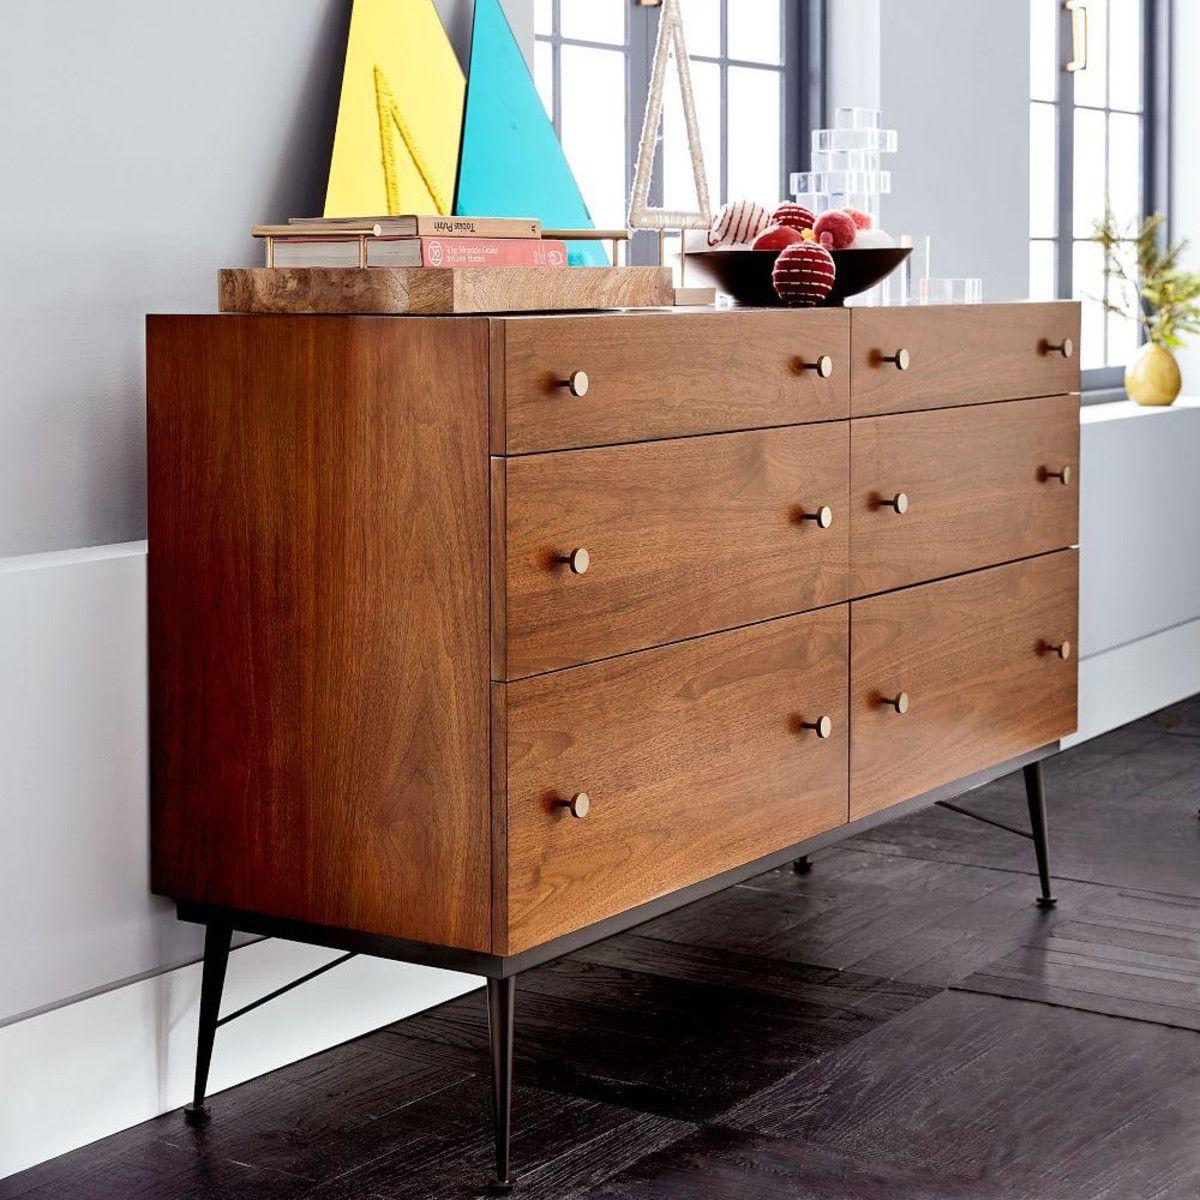 Paulson mid century 6 drawer chest